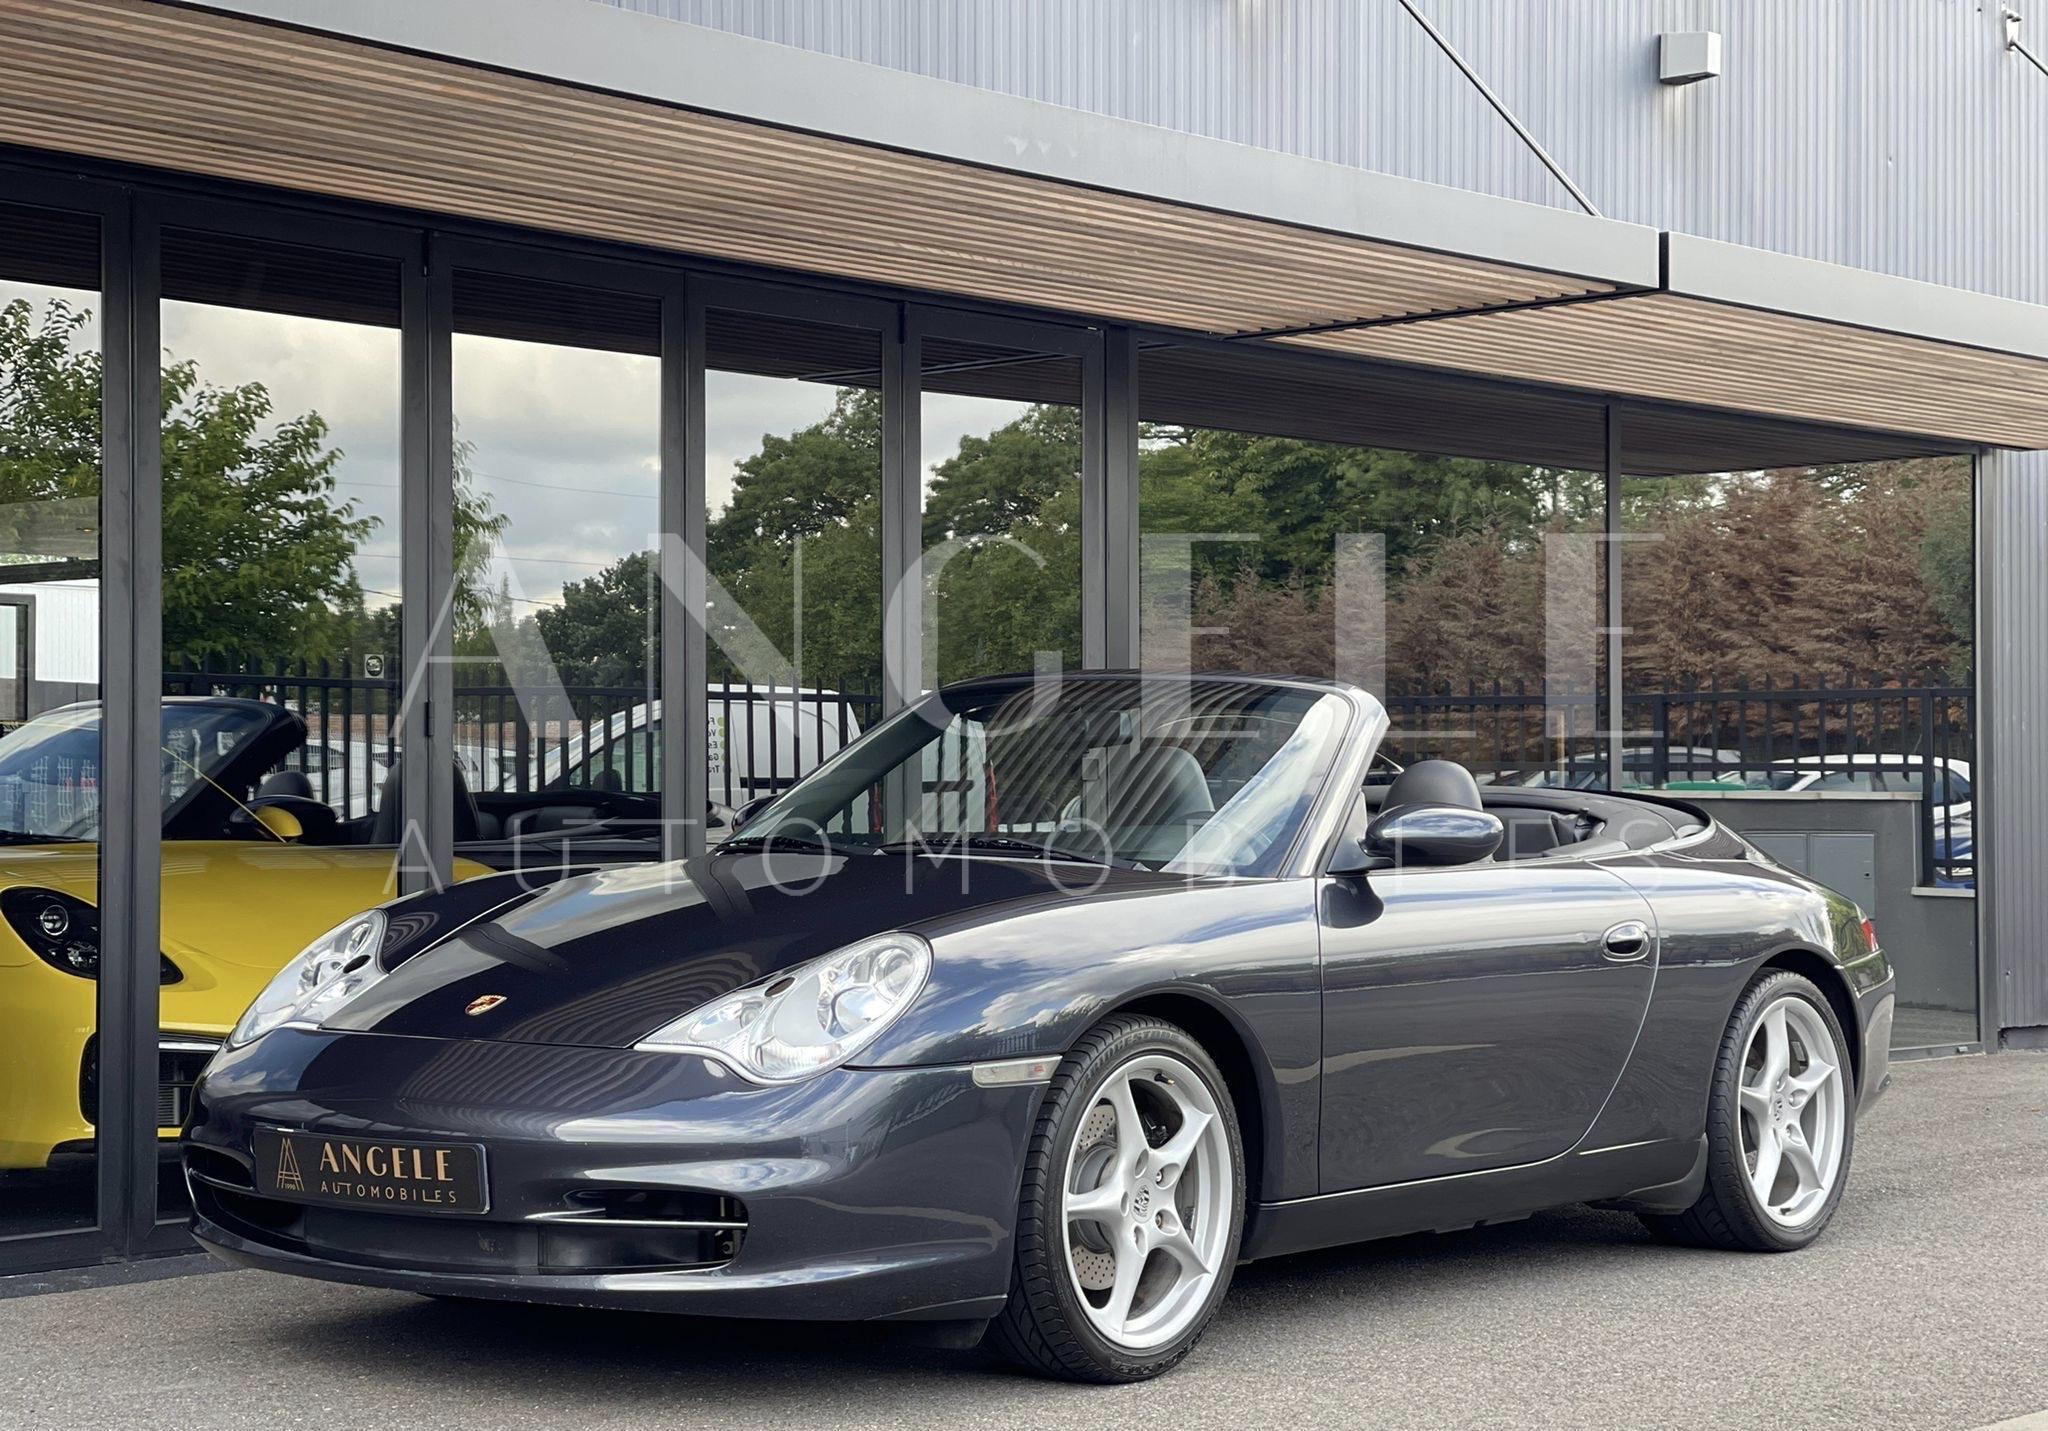 PORSCHE 996 - ANGELE AUTOMOBILES